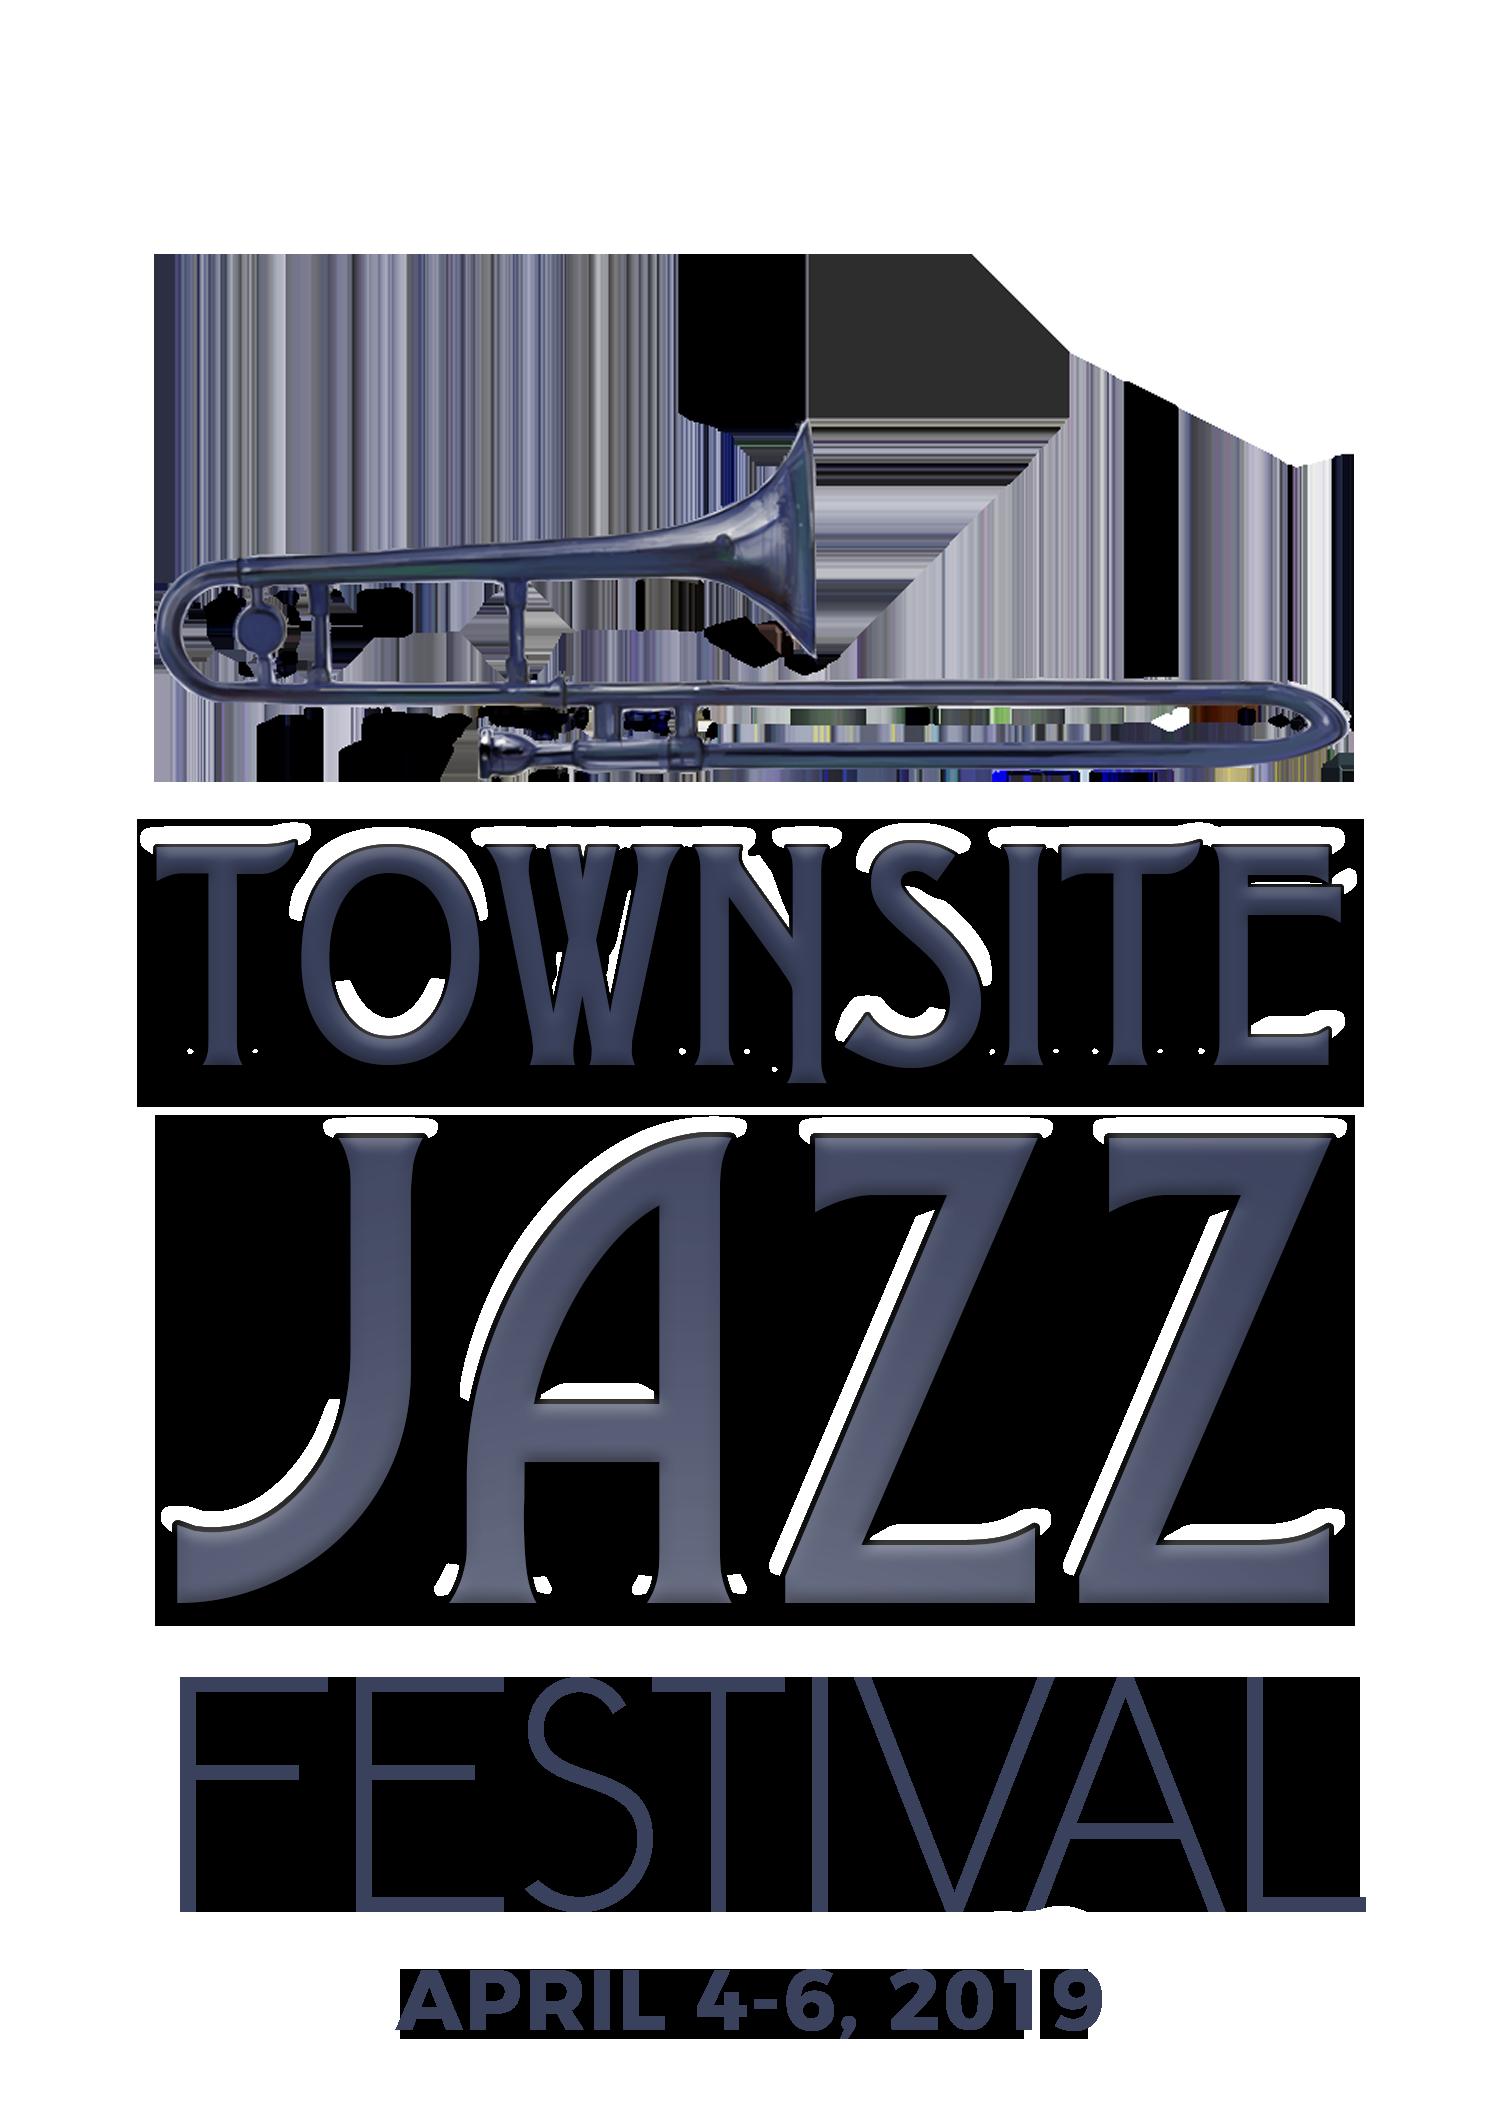 Townsite Jazz Festival